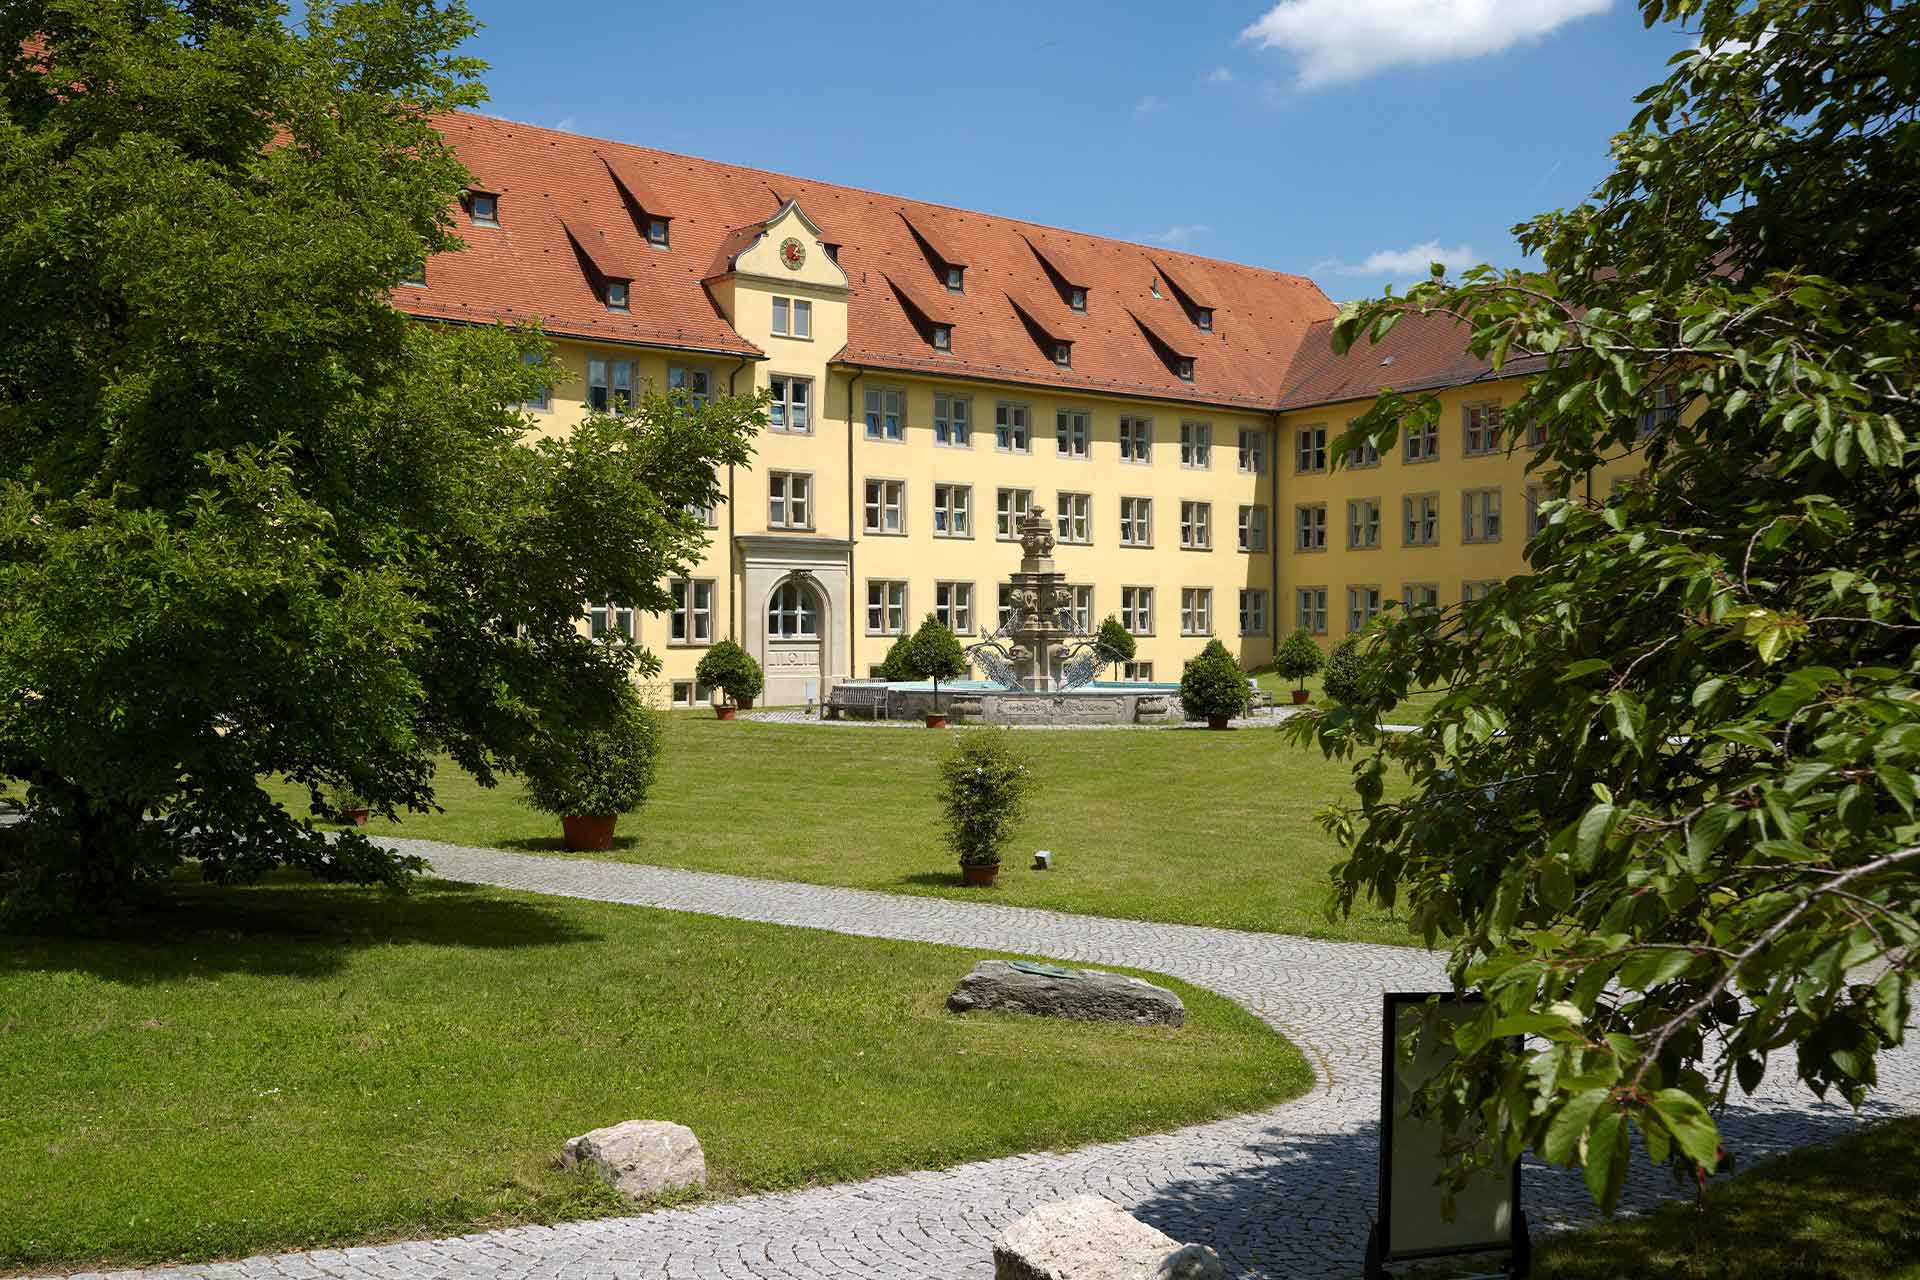 Stadtwerke Winnenden: Regionaler Energieversorger Schloss Winnenden